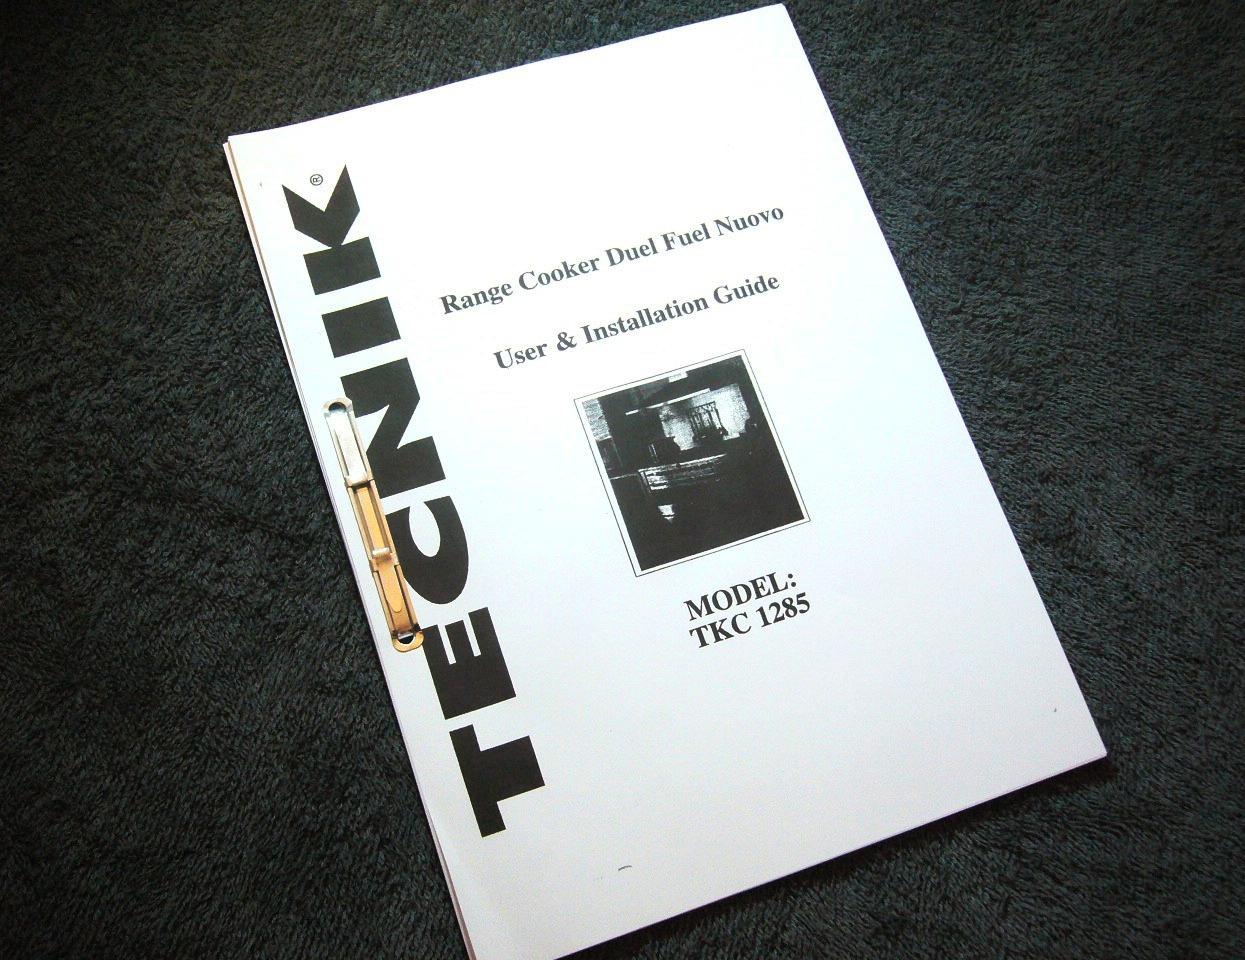 tecnik range cooker manual iPod Nano User Guide Apple iPhone User Guide